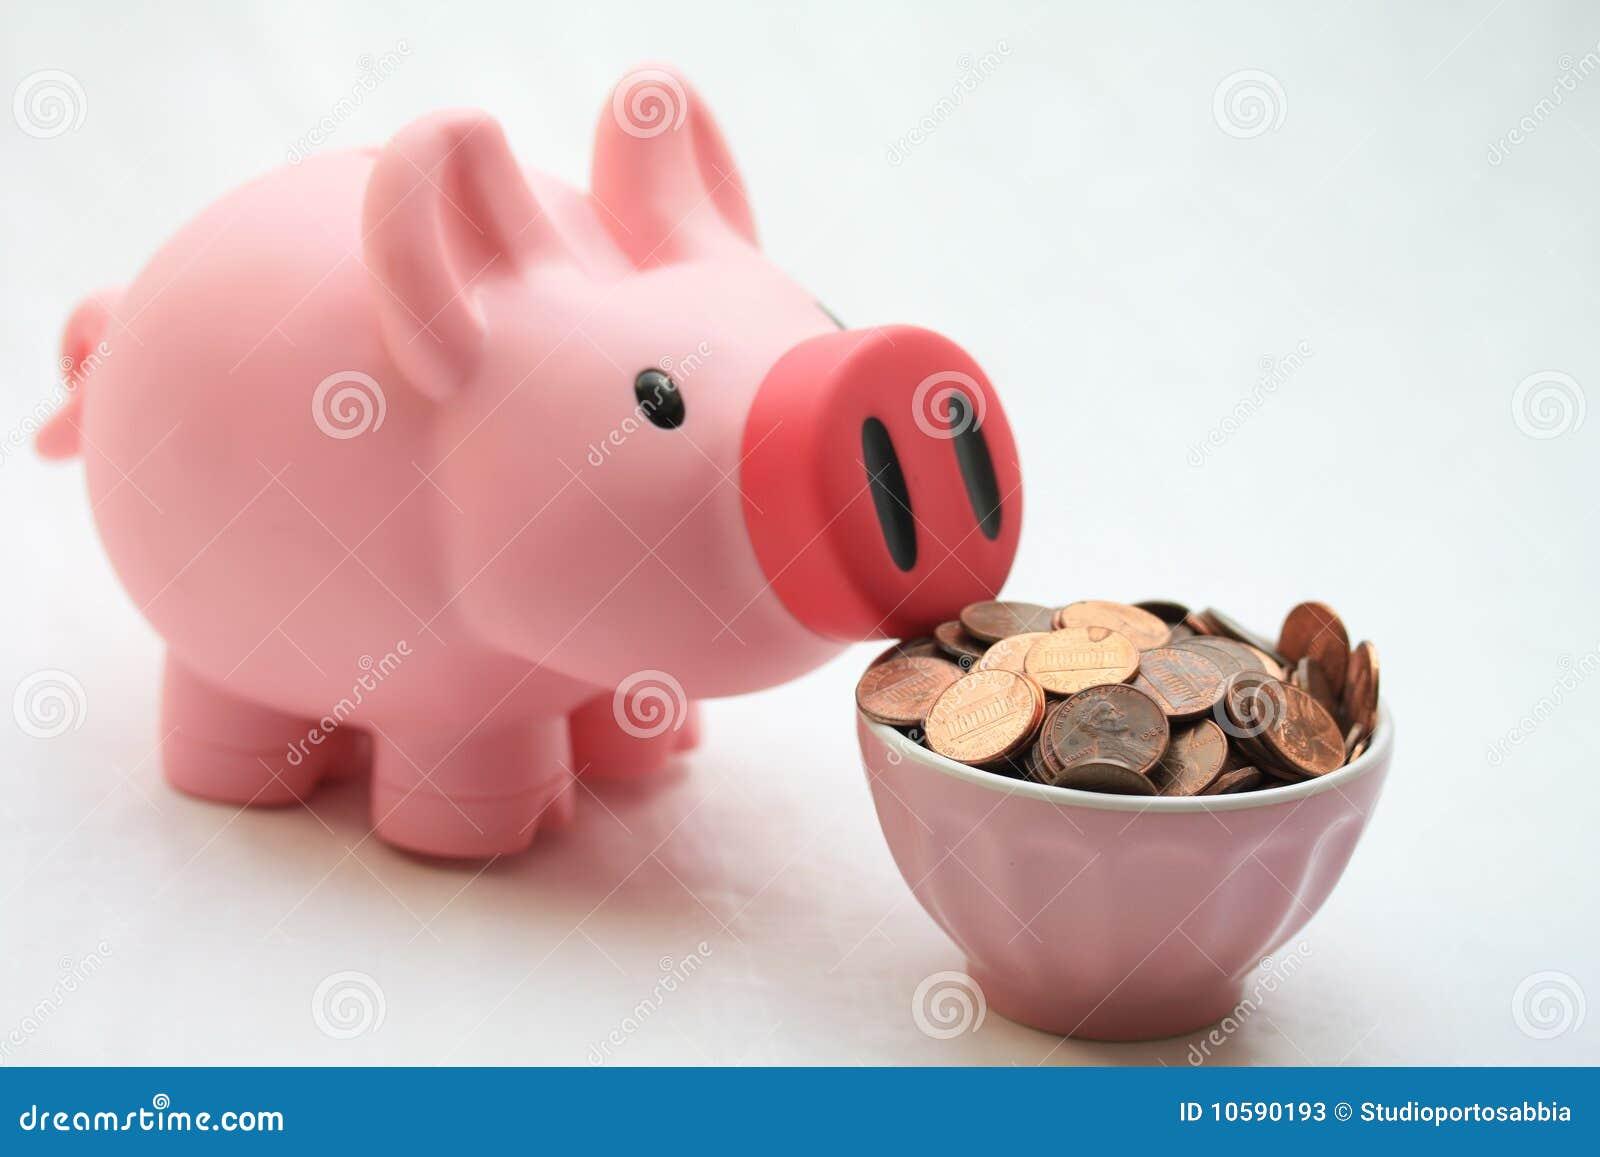 Feeding your piggy bank